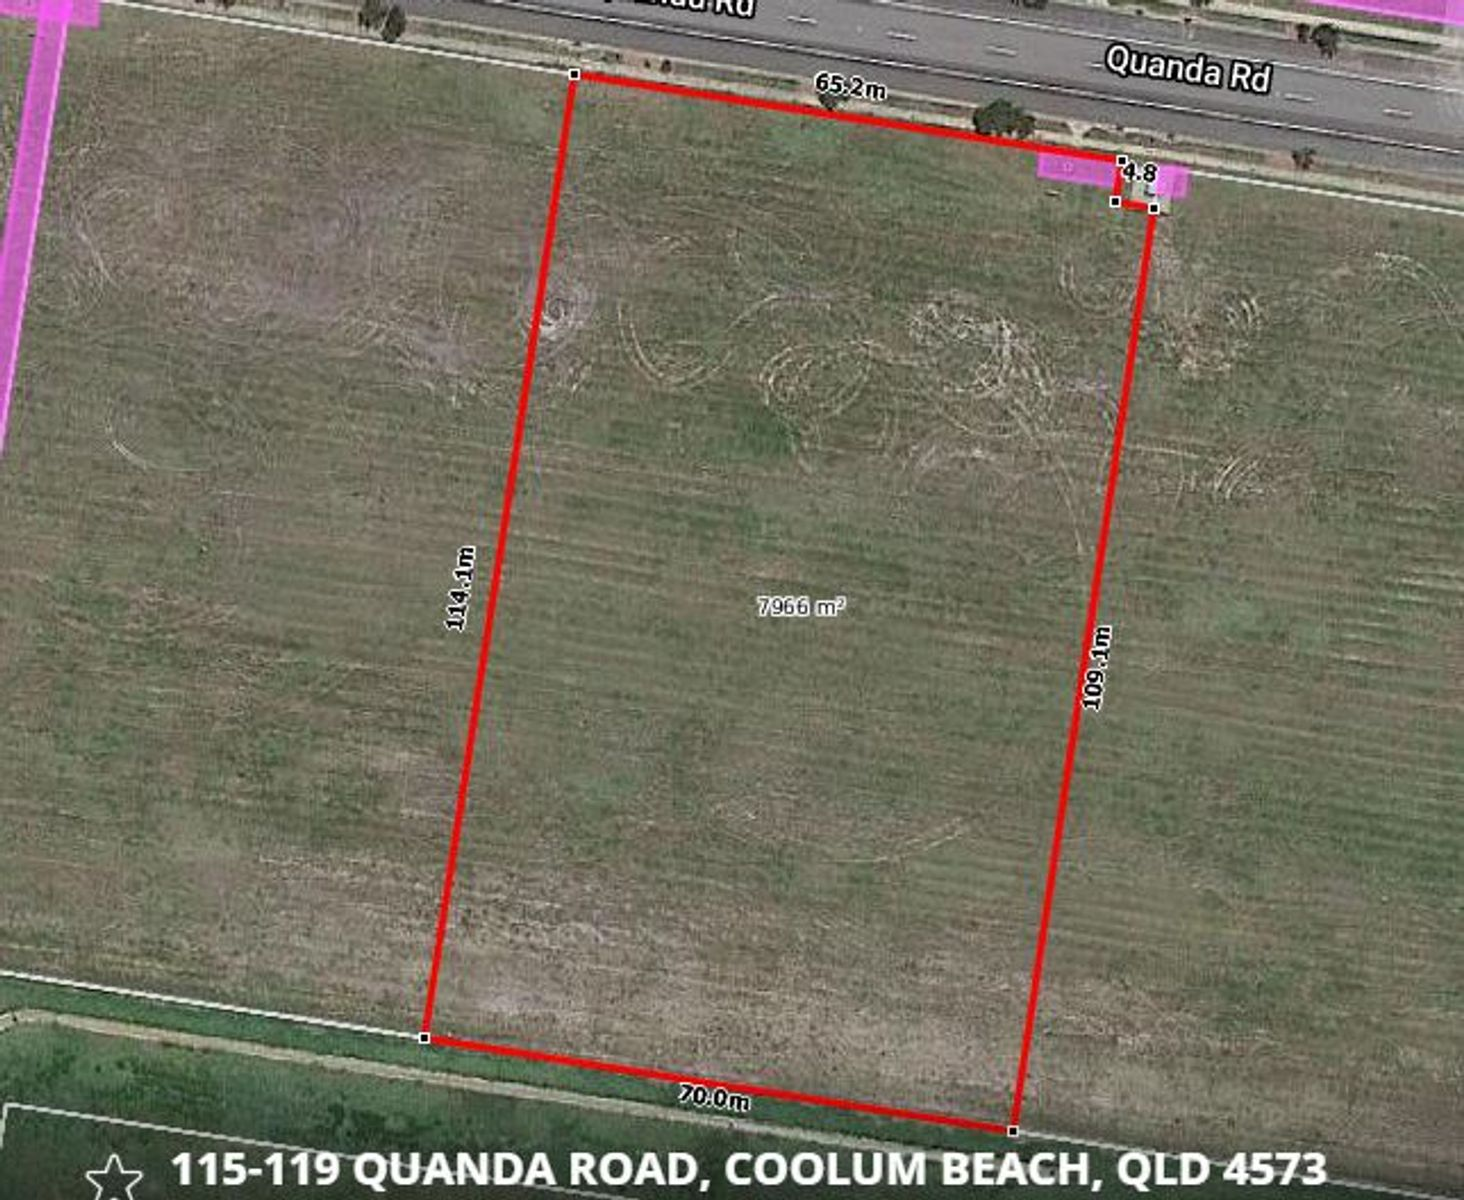 115-119 Quanda Road, Coolum Beach, QLD 4573